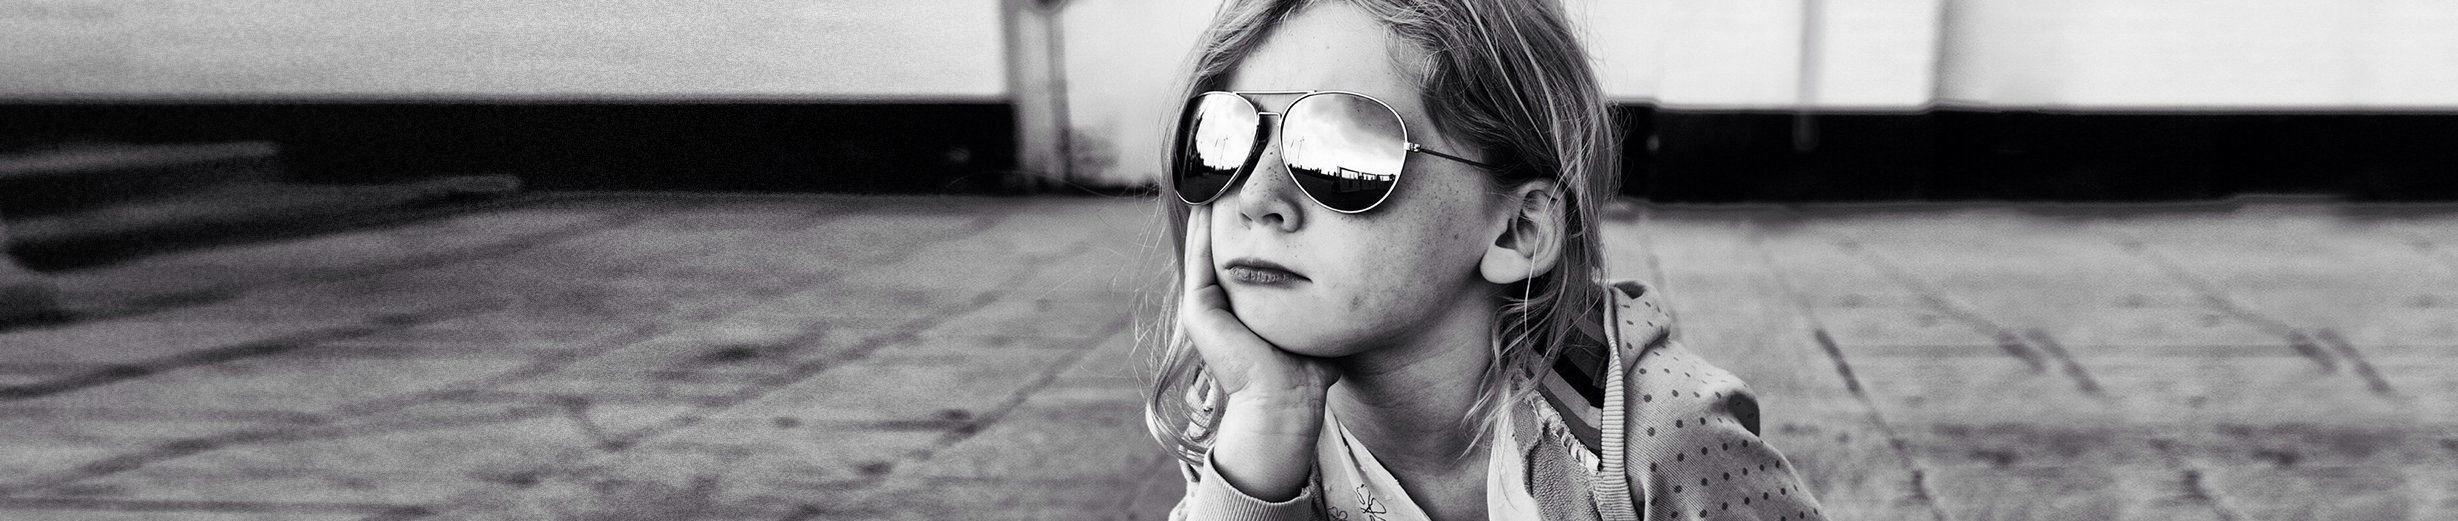 Glassesgallery - 兒童眼鏡